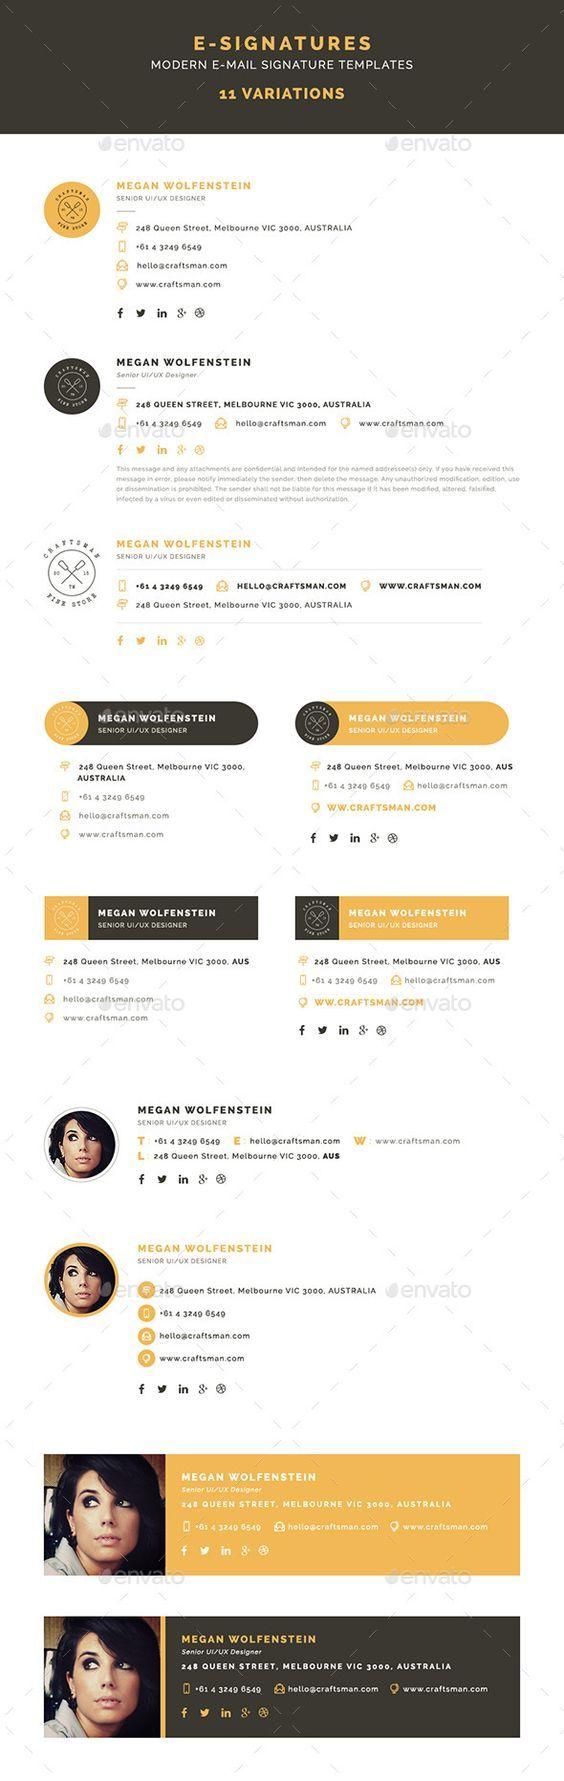 33 best email signatures images on Pinterest | Signature design ...